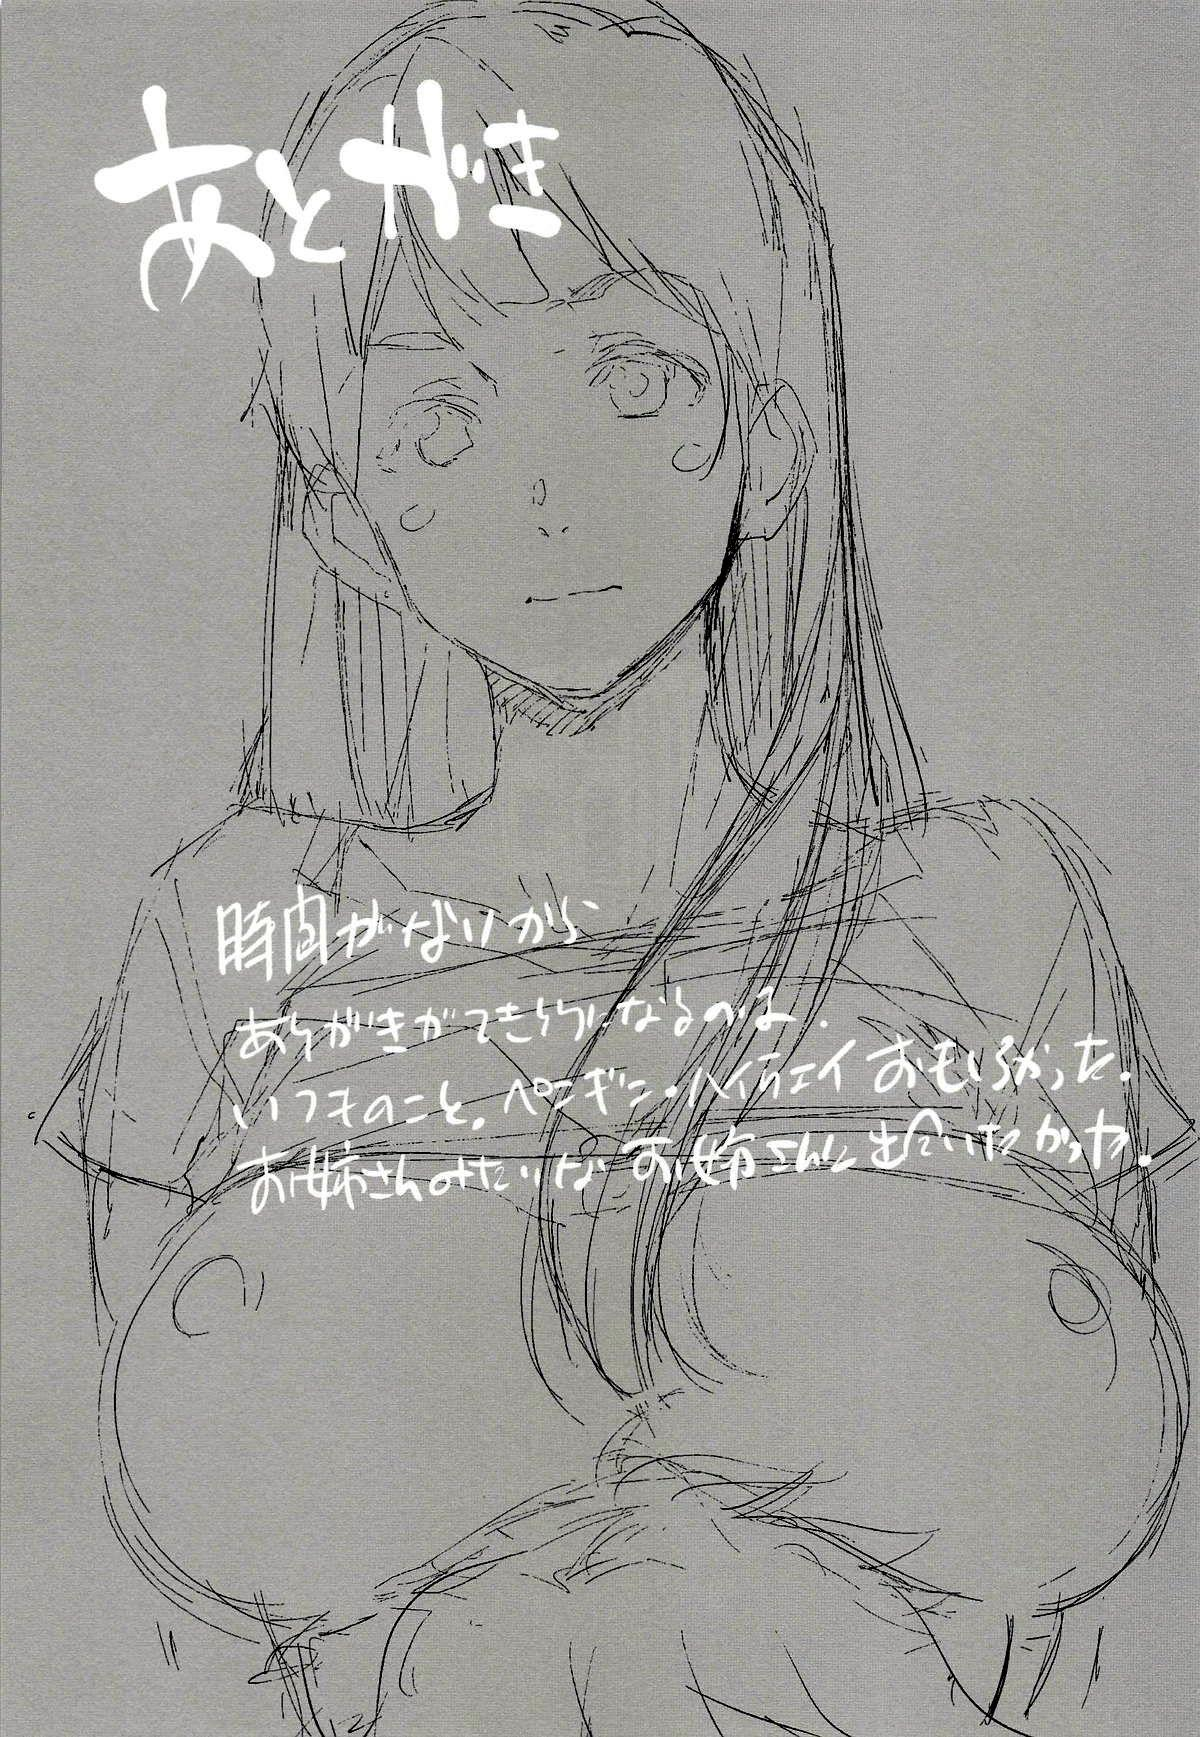 (COMIC1☆14) [Camrism (Kito Sakeru)] Oppai Highway - Onee-san no Kenkyuu (Penguin Highway) [English] [Kaijuko] 23